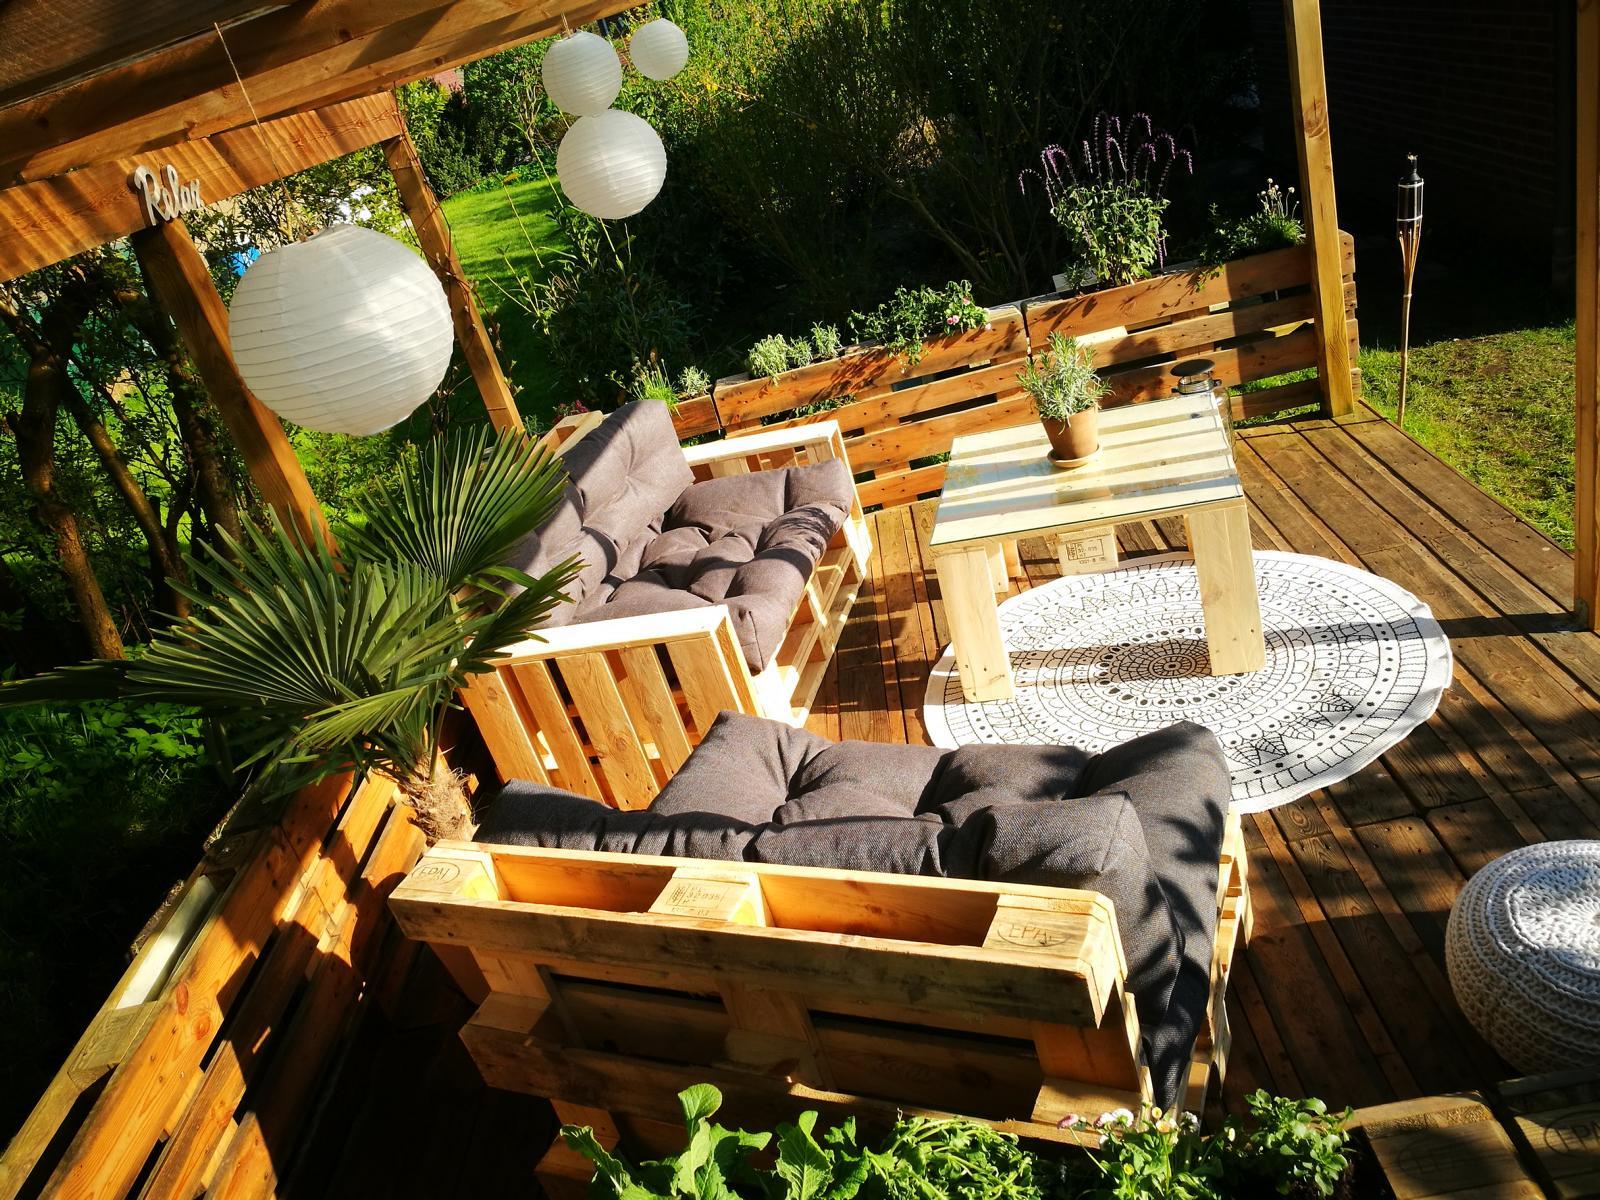 palettenkissen set-palettensofa-paletten-lounge